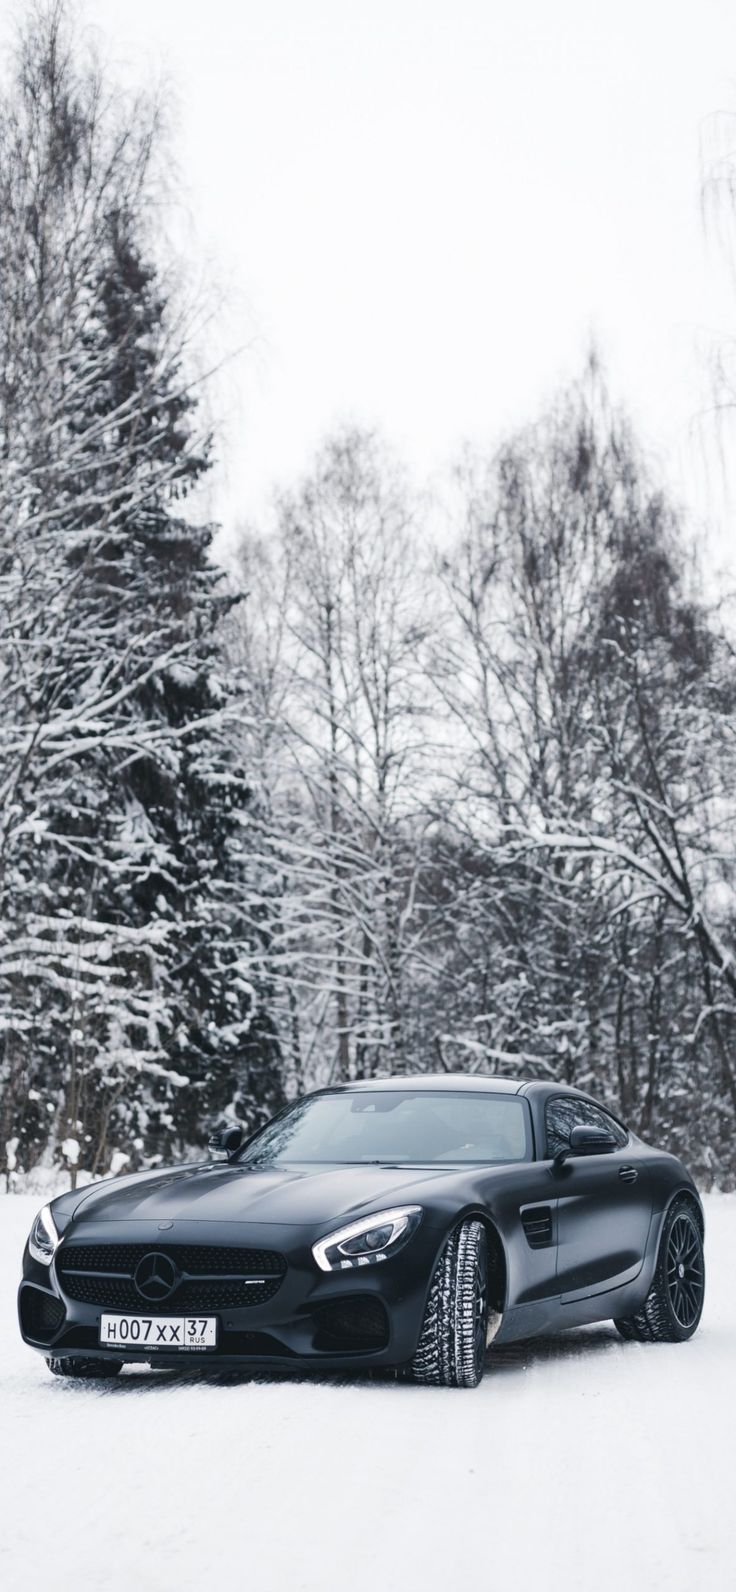 Mercedes Benz Amg Car In Snow Super Hd Wallpapers Download Free Wallpaper mercedes benz logo car salon